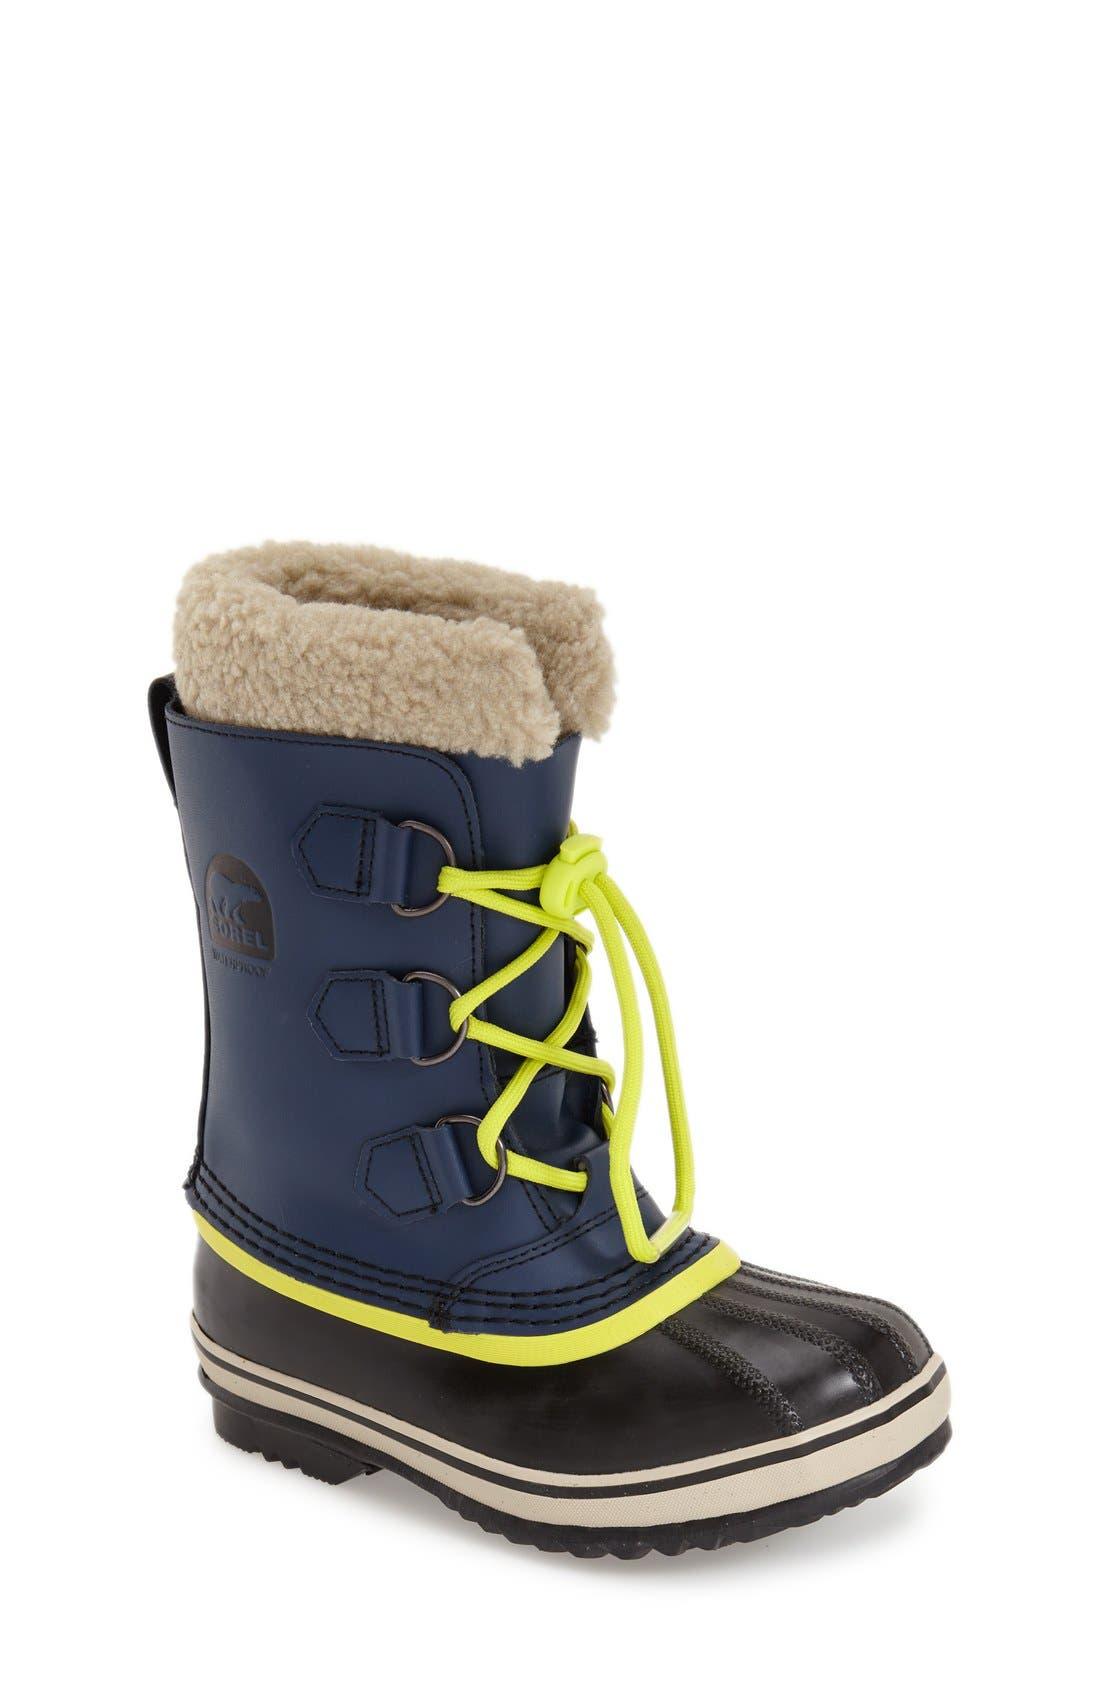 Main Image - SOREL 'Yoot Pac' Waterproof Snow Boot (Toddler, Little Kid & Big Kid)